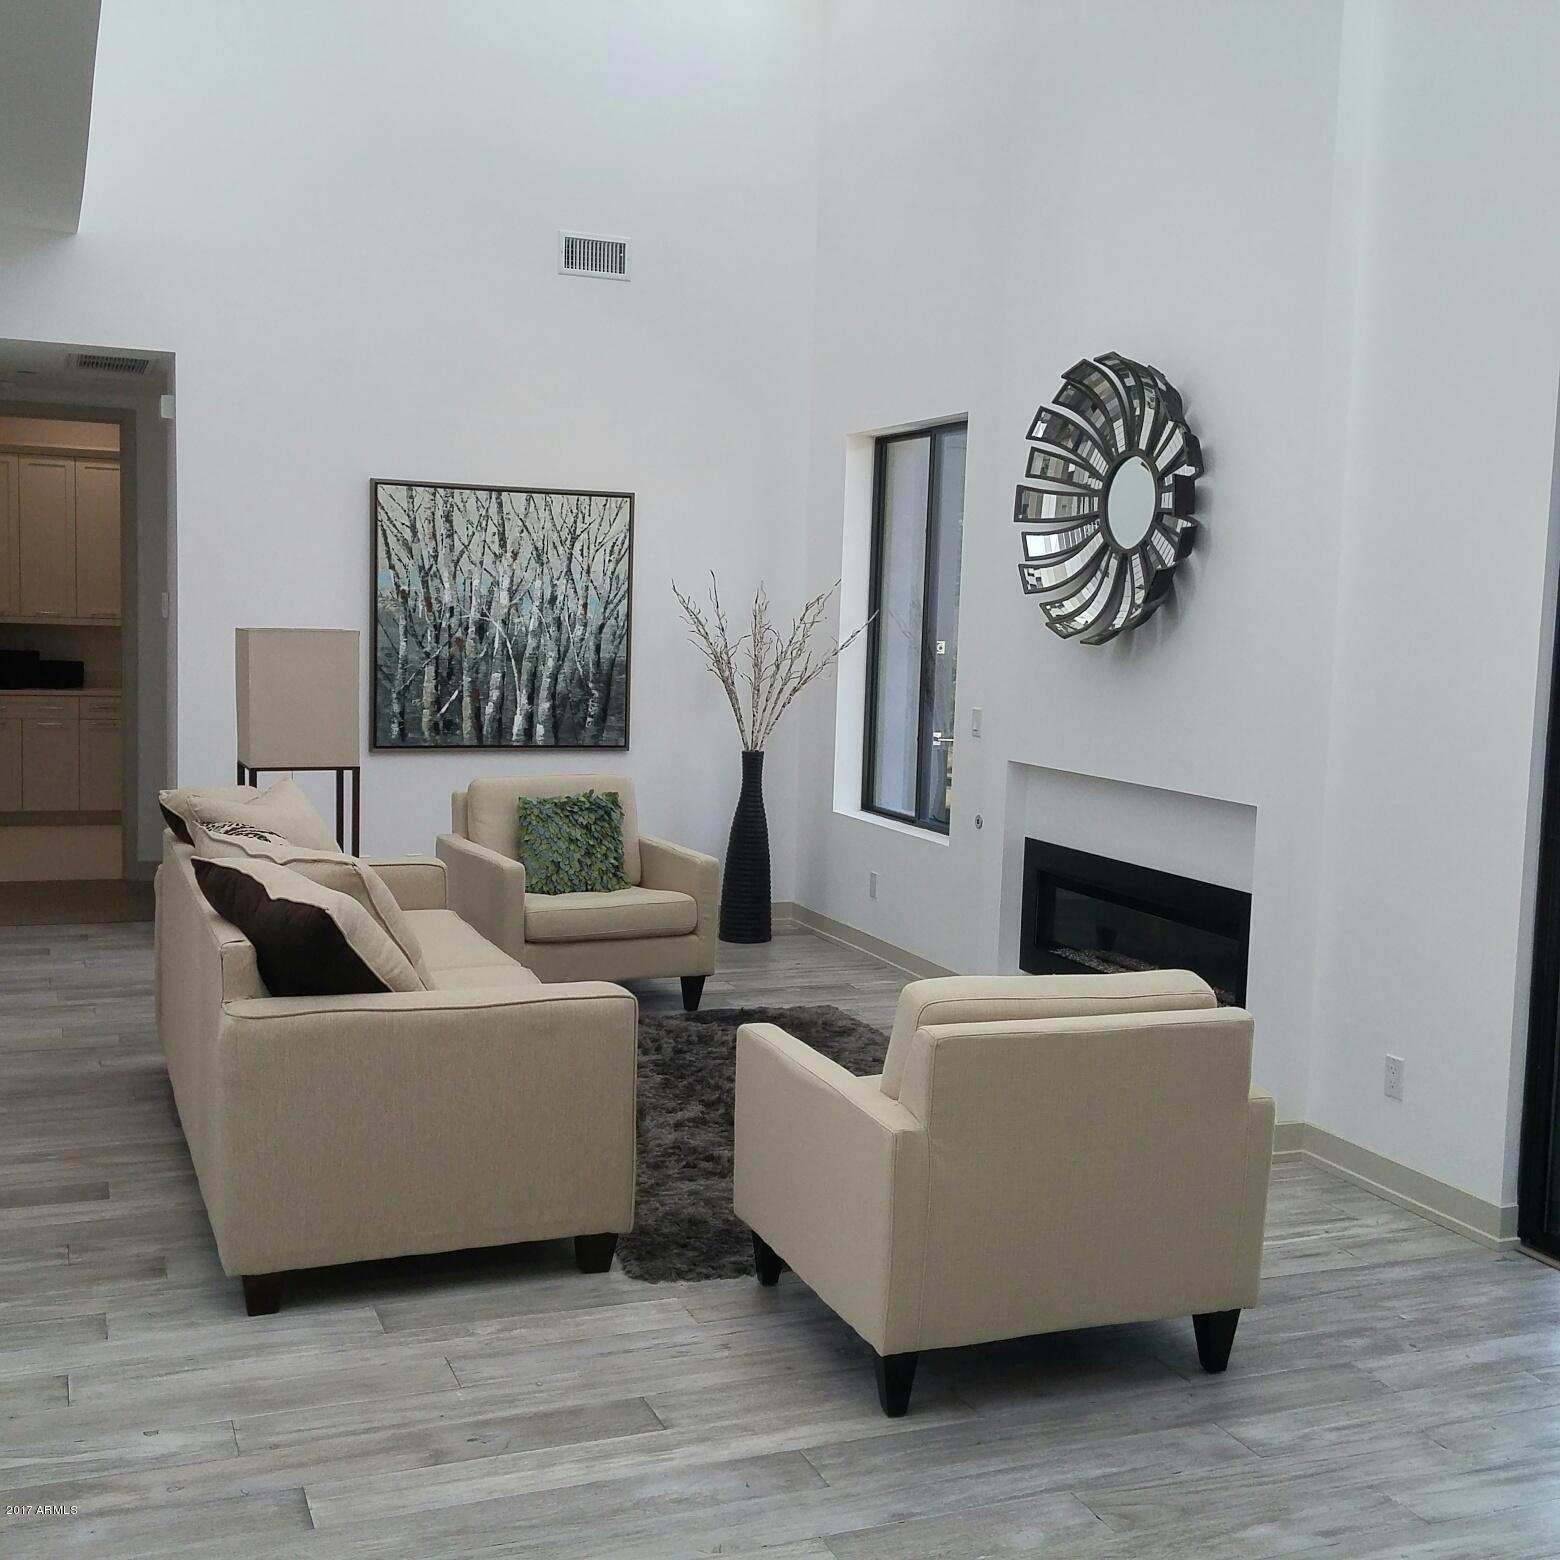 3418 N 62ND Street Scottsdale, AZ 85251 - MLS #: 5563625